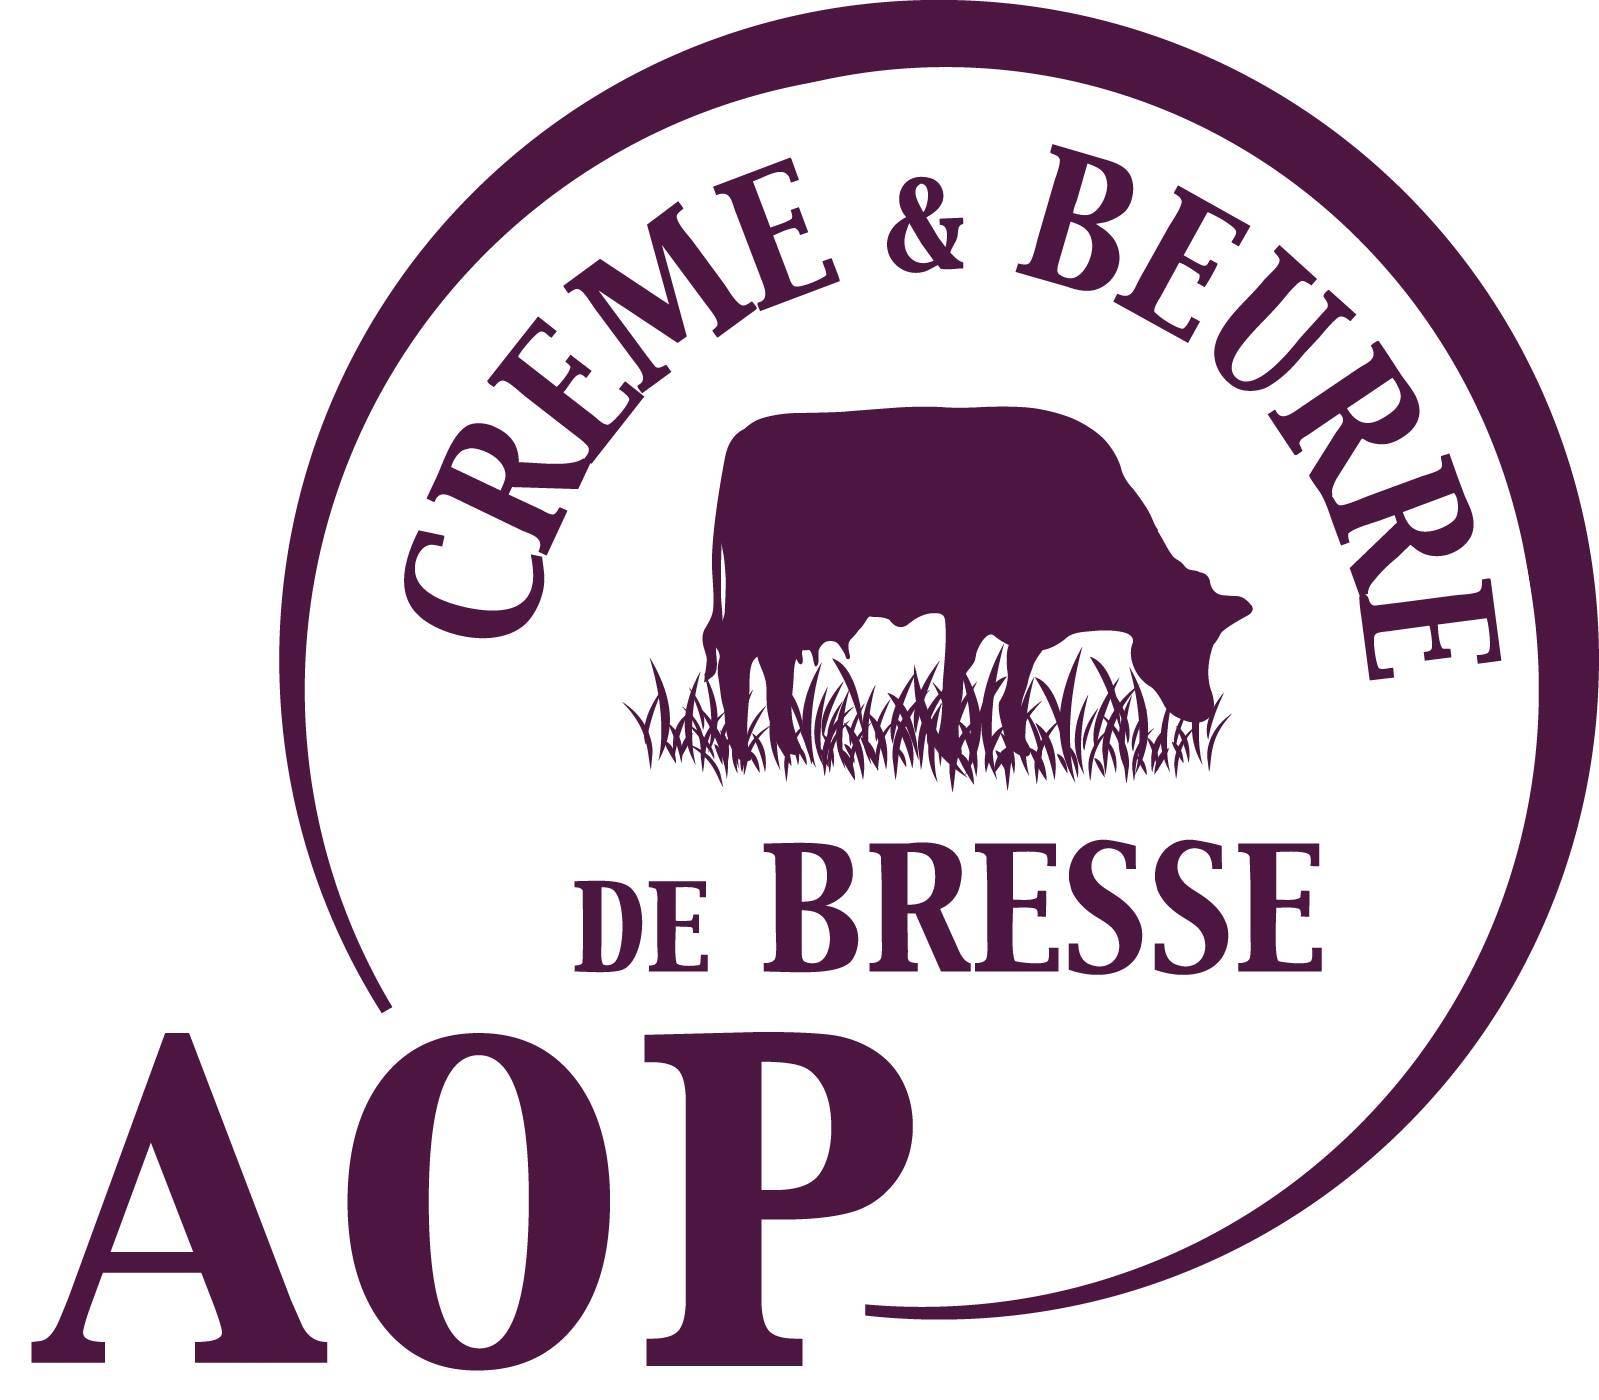 AOP Creme Beurre Bresse